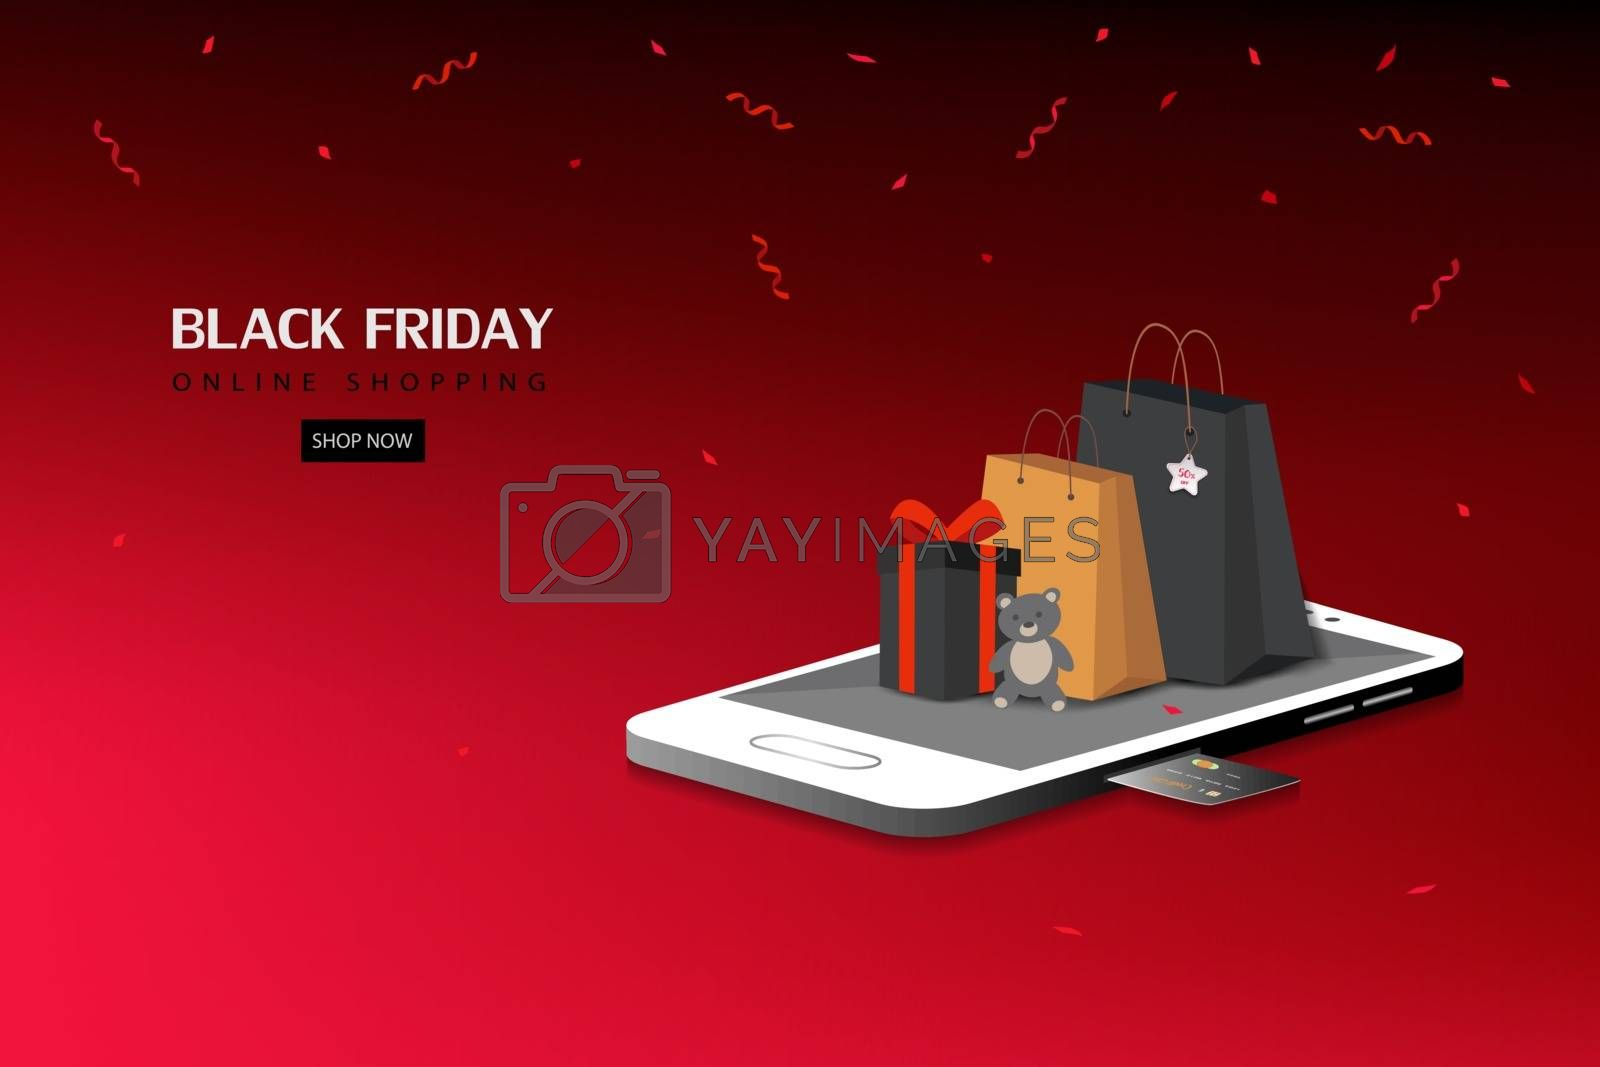 Black friday shopping online on social media mobile application or website concepts,vector illustration